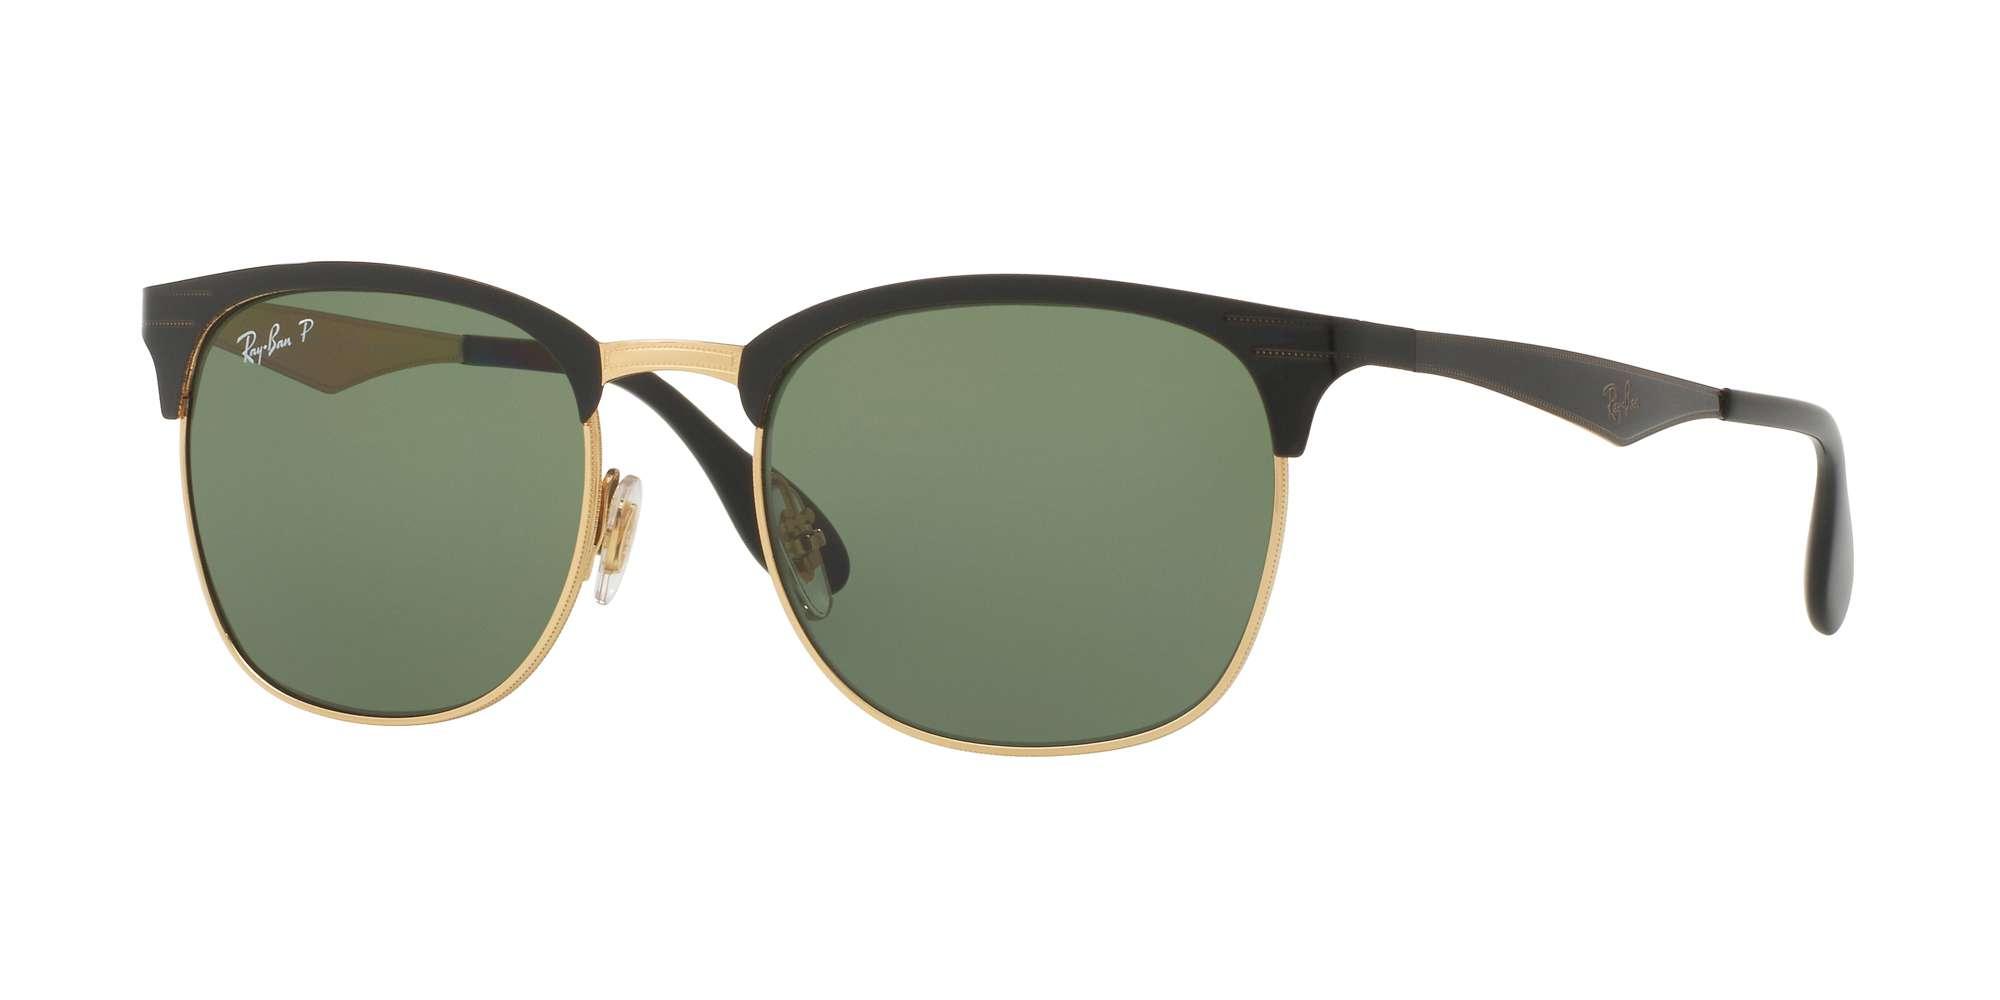 TOP SHINY BLACK ON GOLD / DARK GREEN POLAR lenses